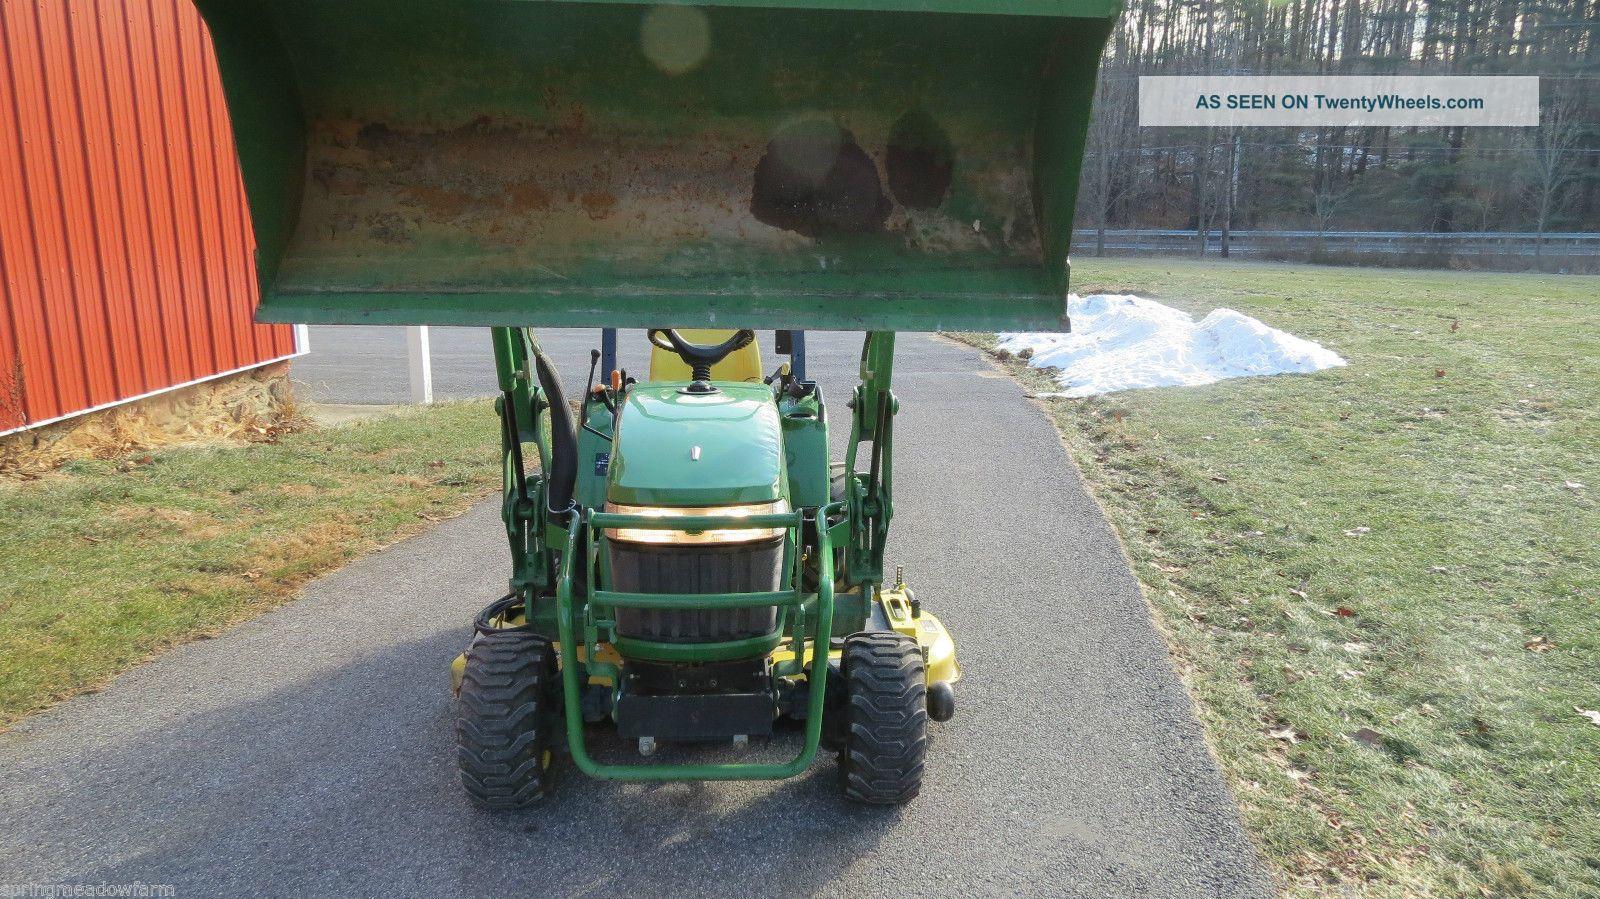 2007 John Deere 2305 4x4 Compact Utility Tractor W/ Loader ...